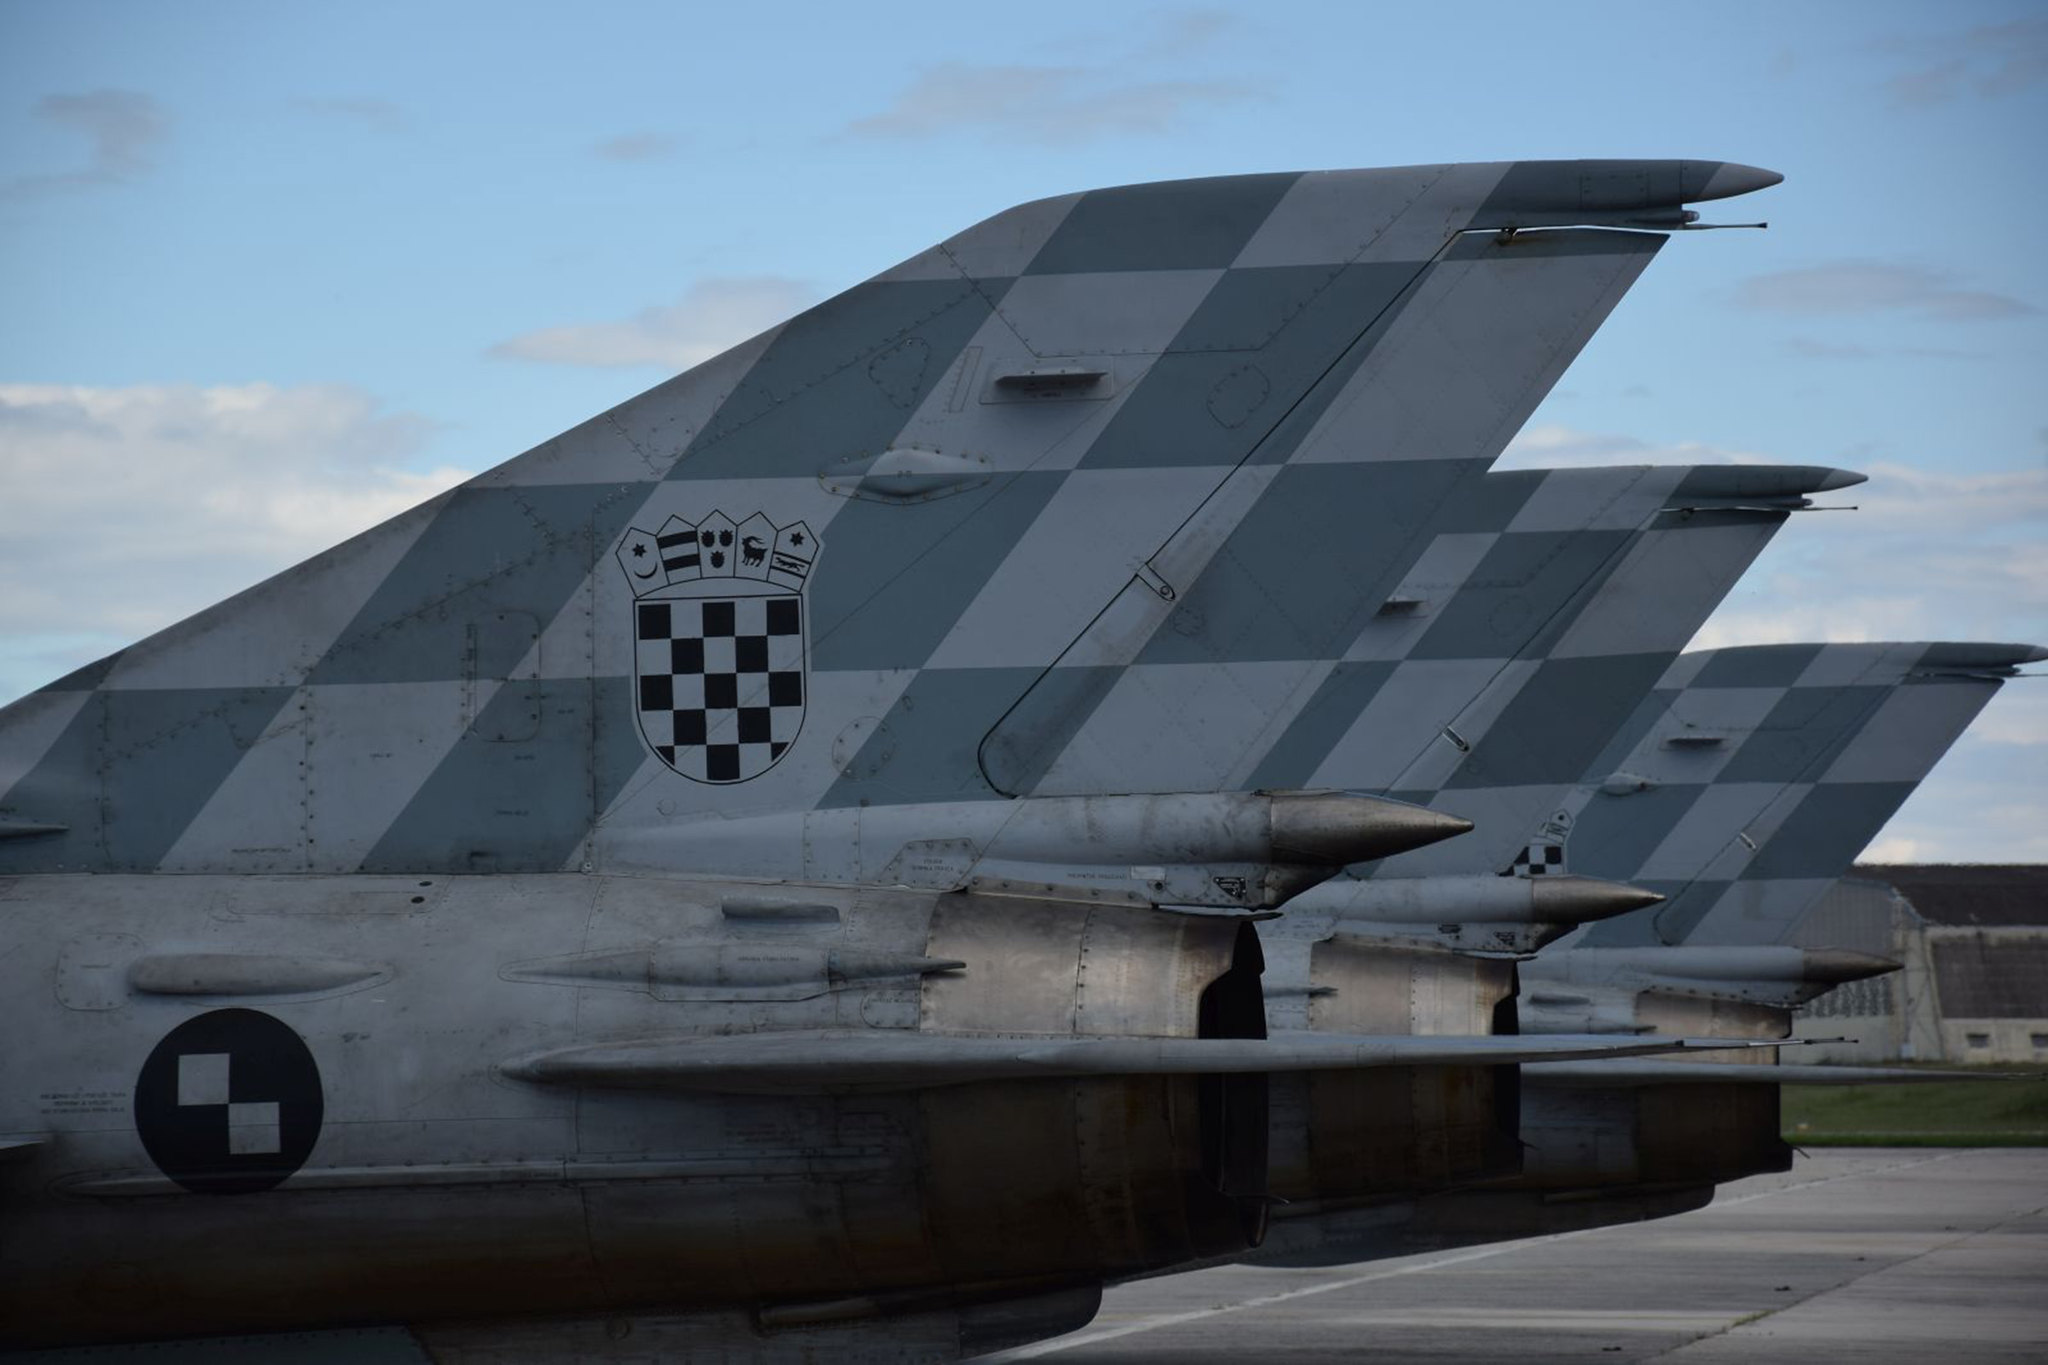 Tjedan Hrvatske vojske – preleti zrakoplova HRZ-a iznad Republike Hrvatske  - MORH